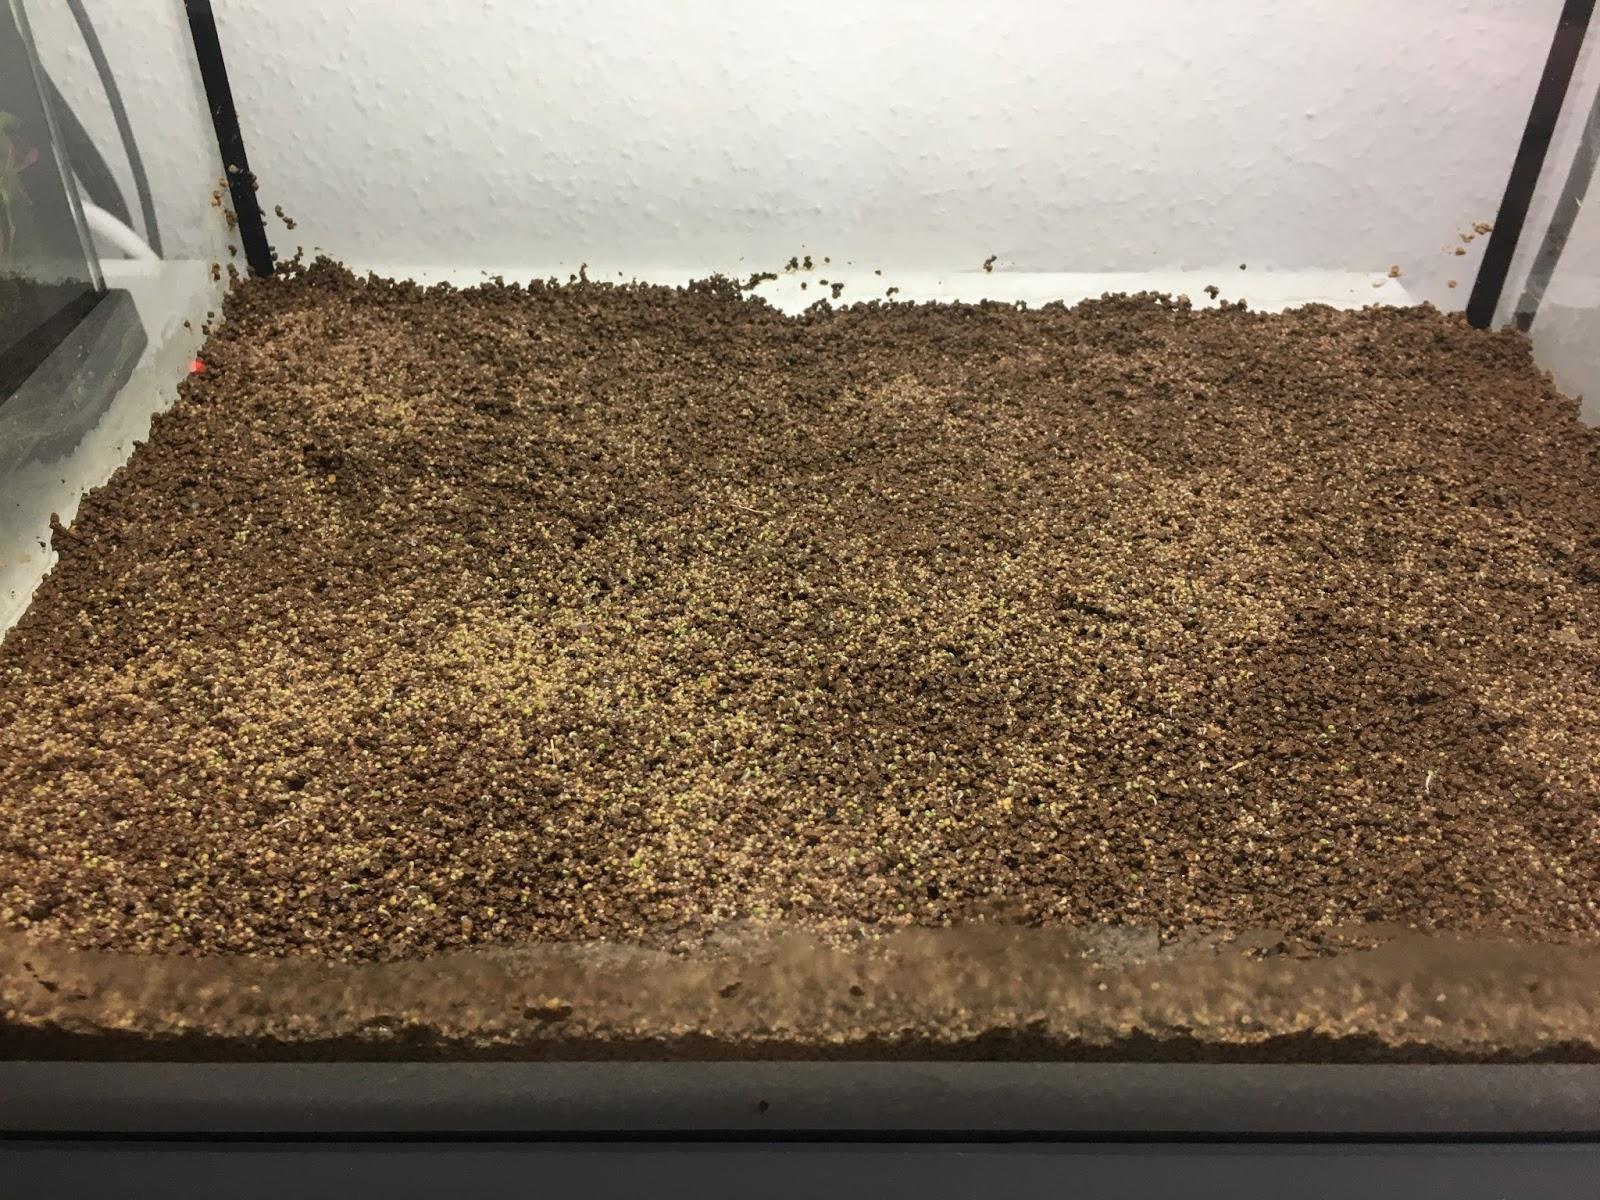 Aquarium Pflanzen Samen Erfahrungen Limnophila Sessiliflora Moos